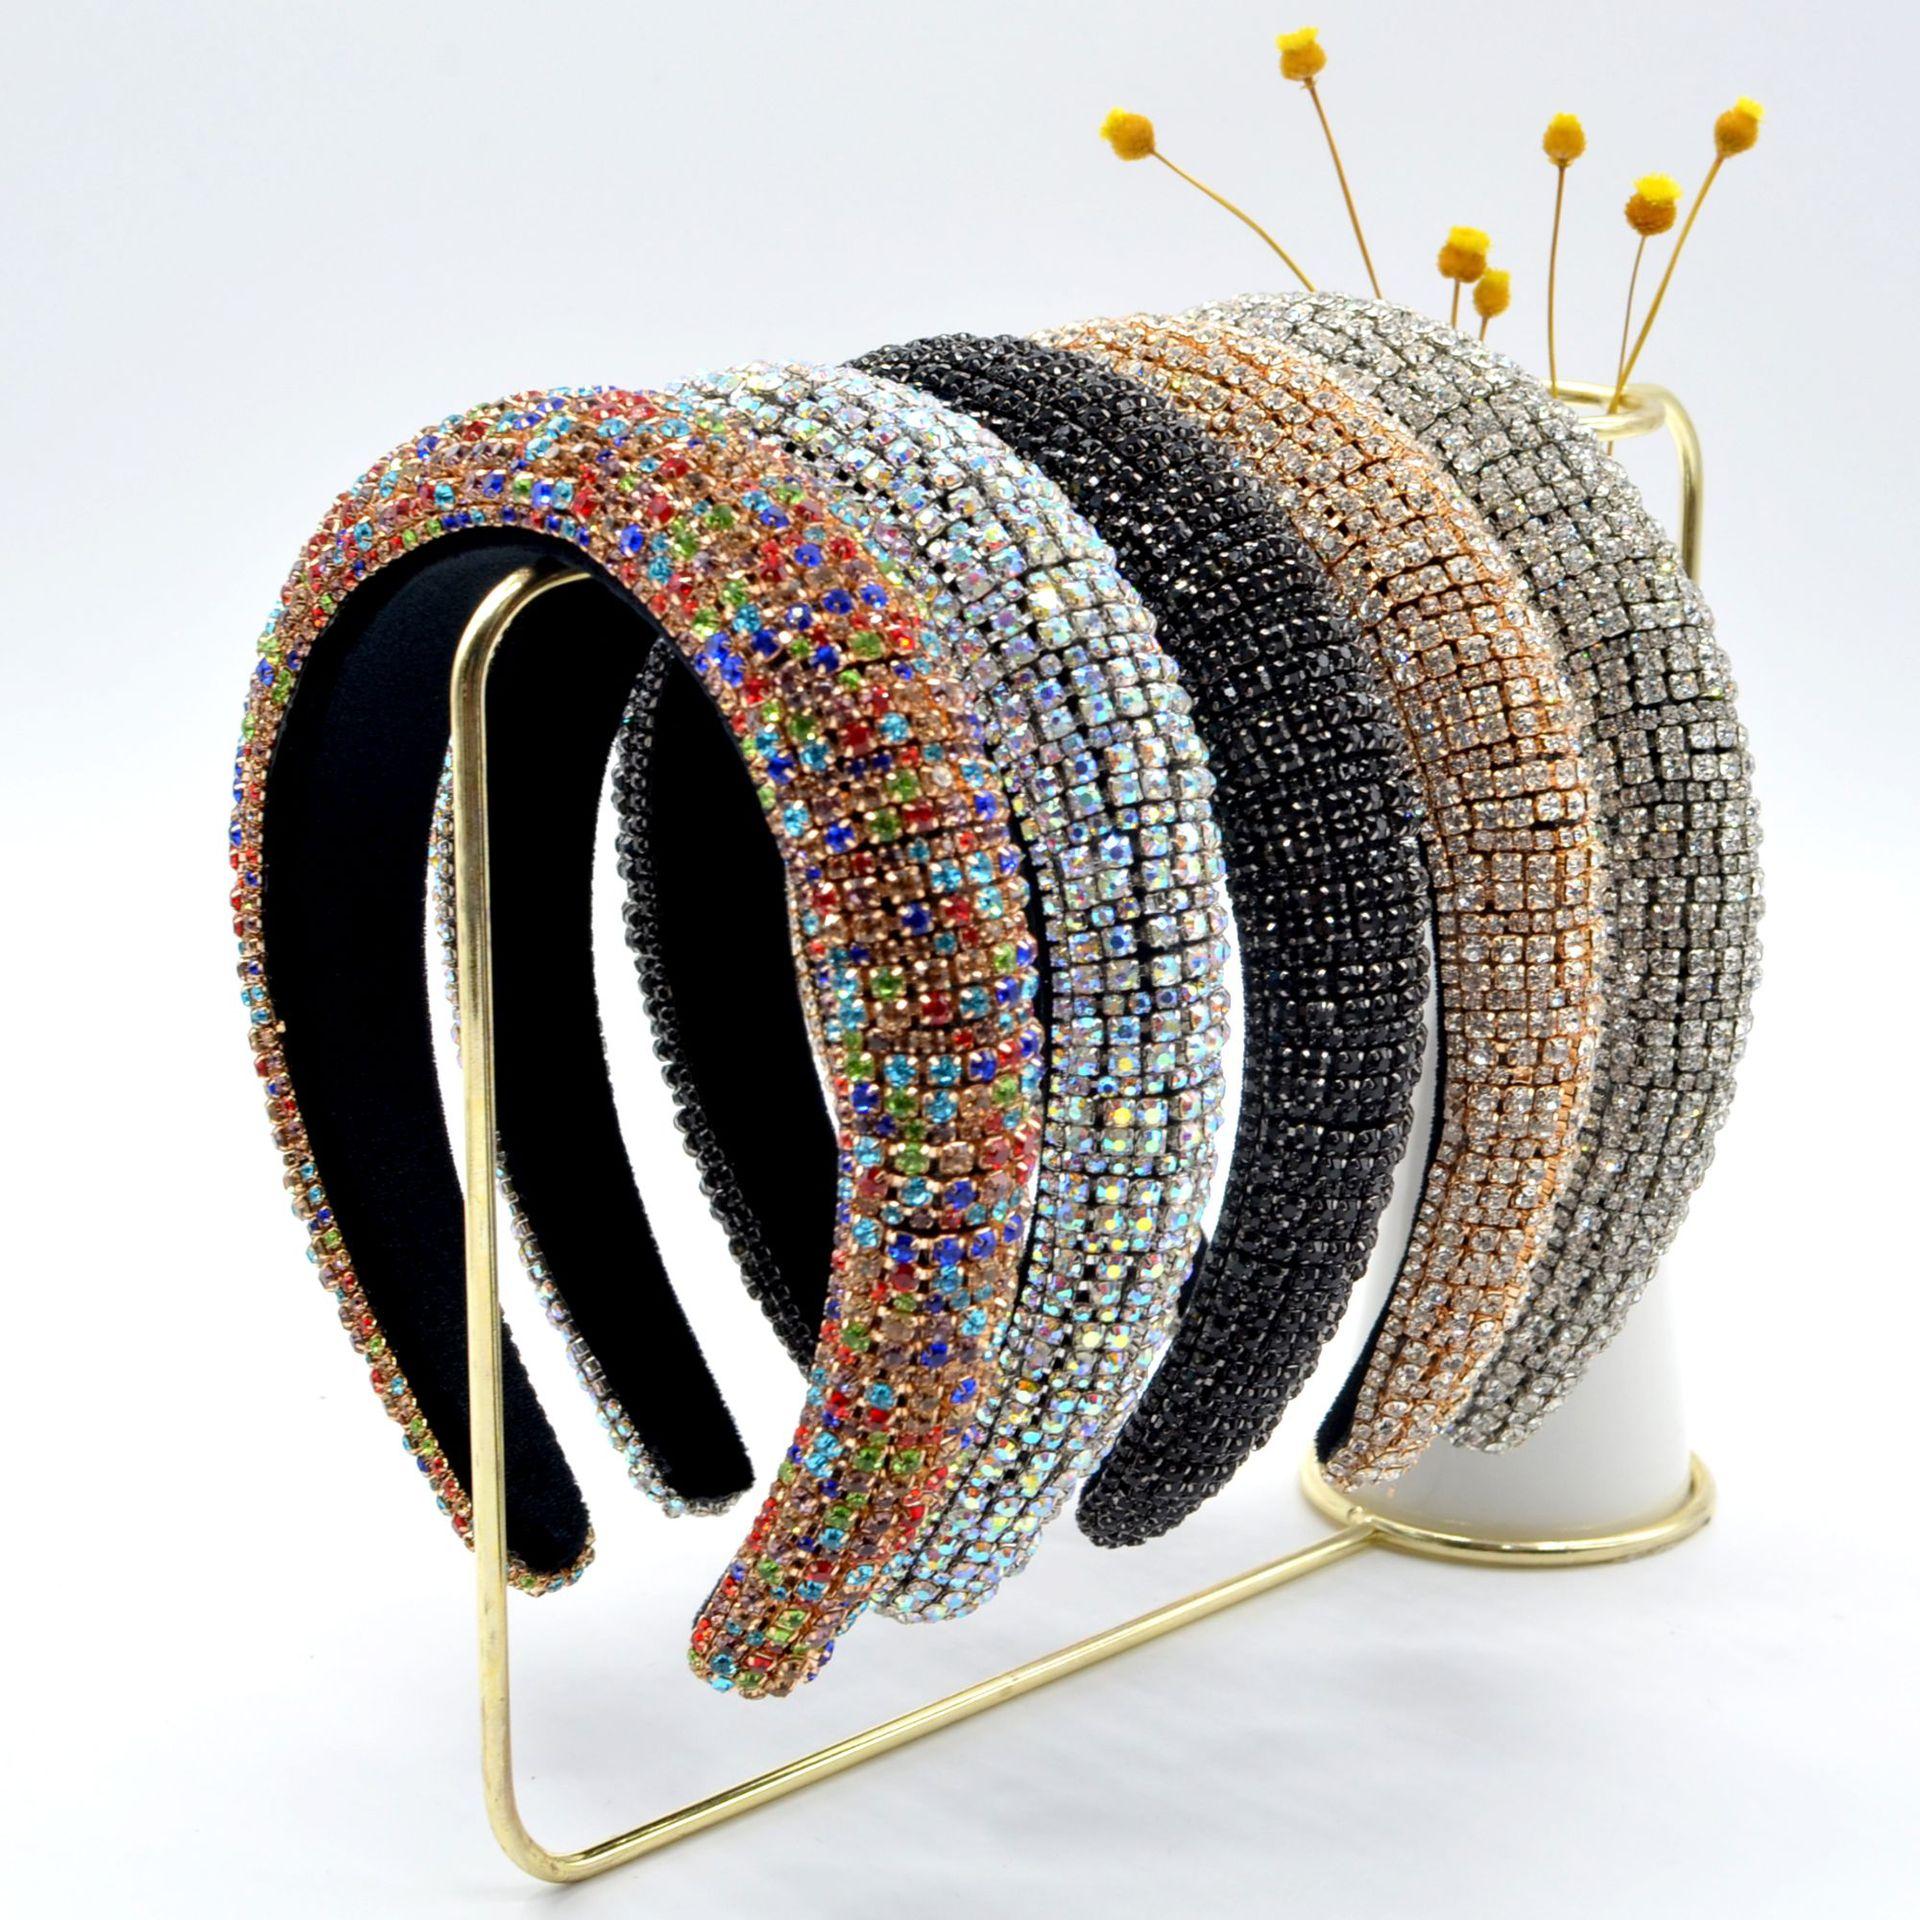 JOLORYM Jewelry-Diadema de ala ancha barroca para mujer, diadema colorida con diamantes de imitación, a la moda, para FG-YL-001 de boda